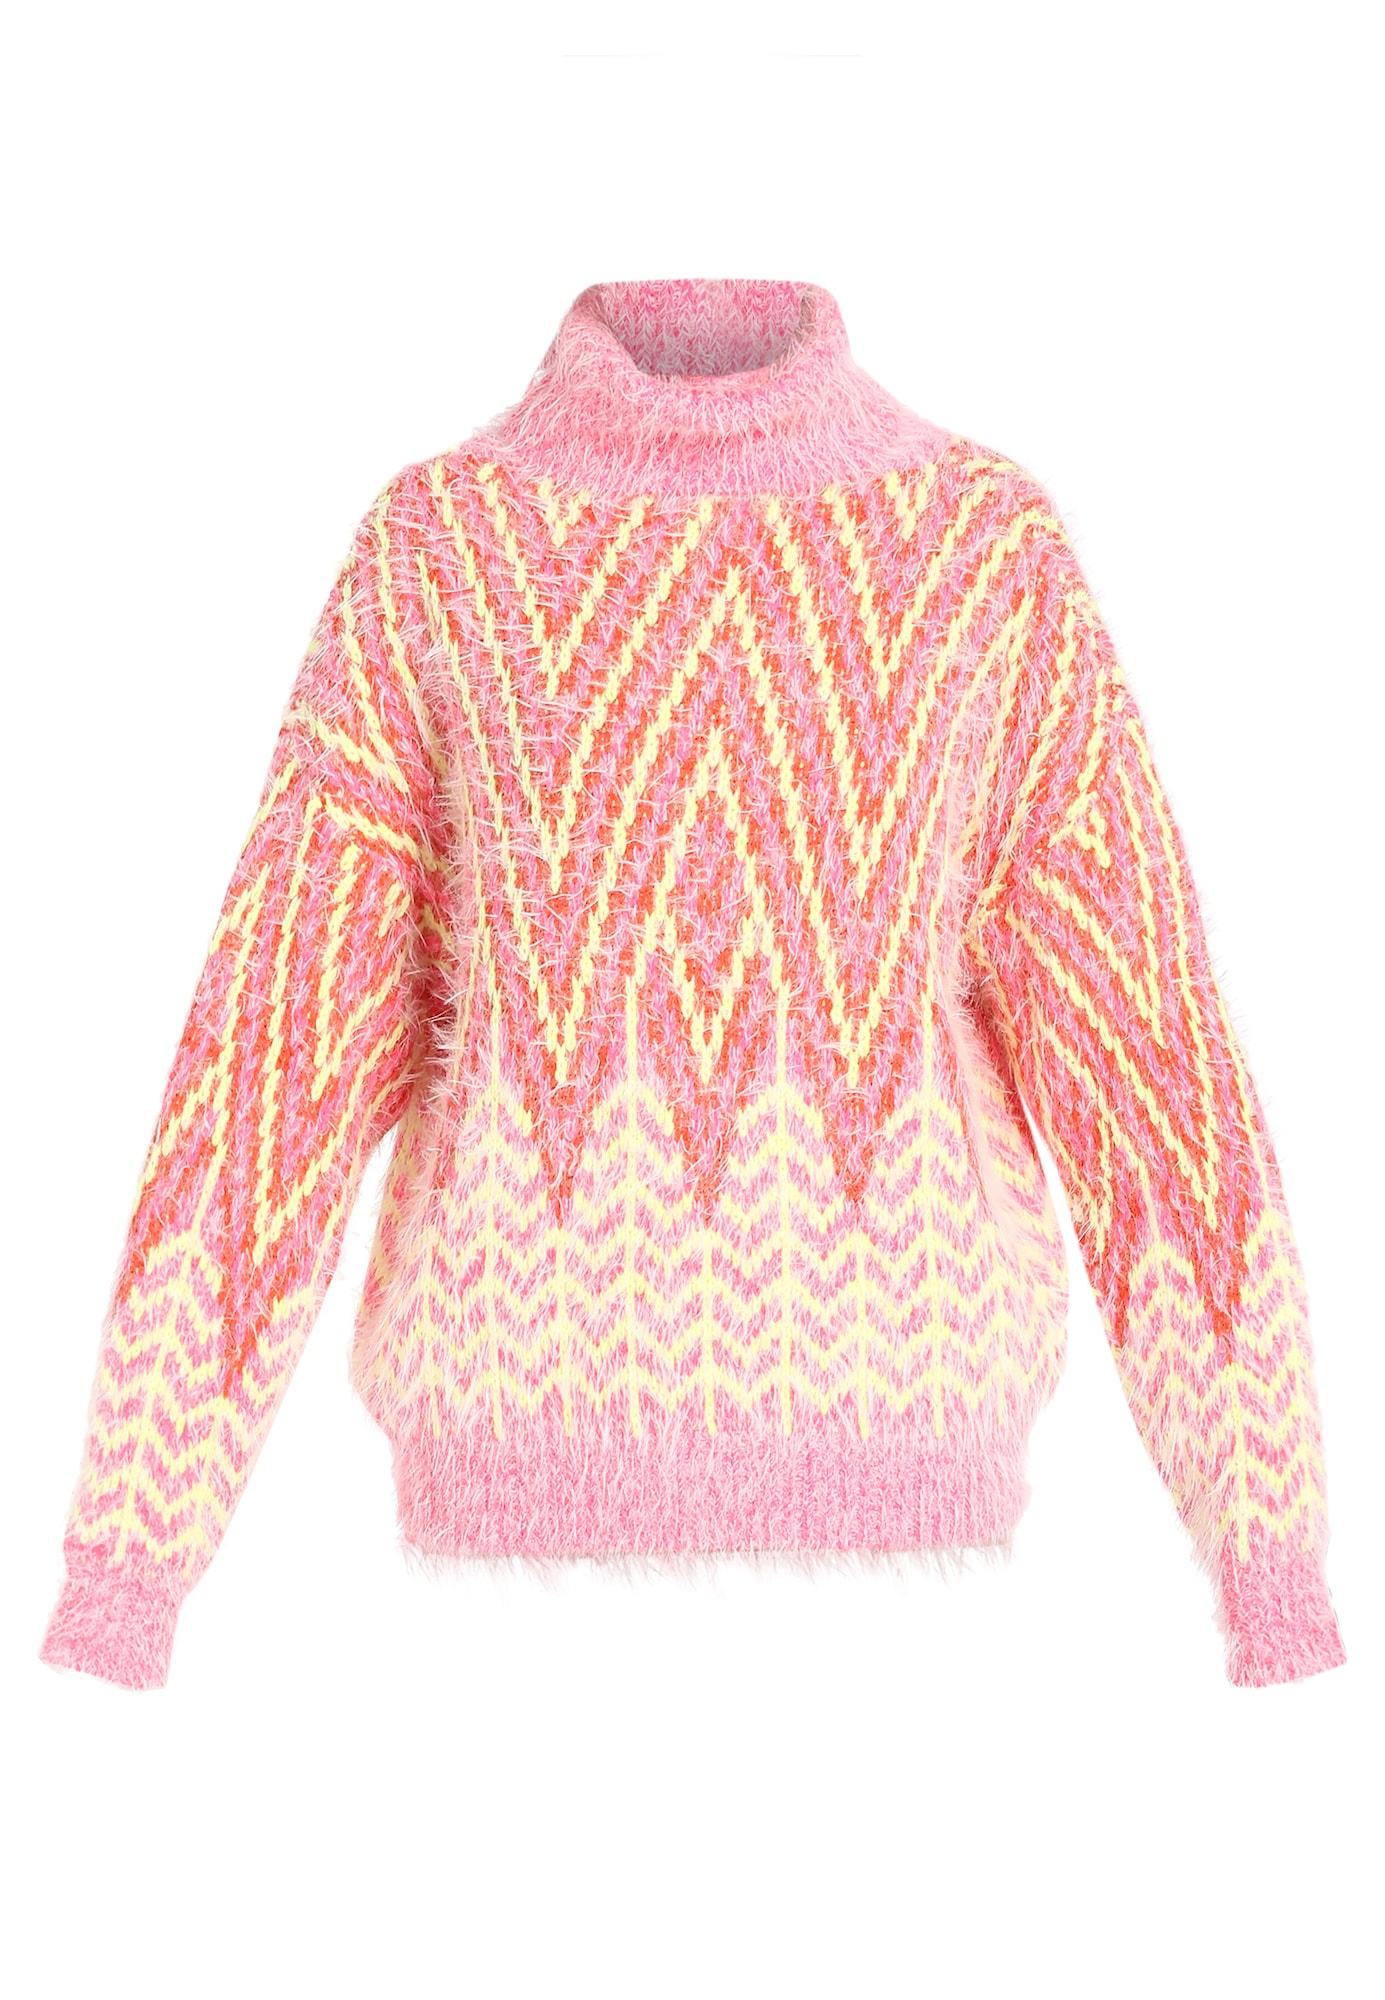 Damen MYMO Pullover bunt,  mehrfarbig | 04059275484530